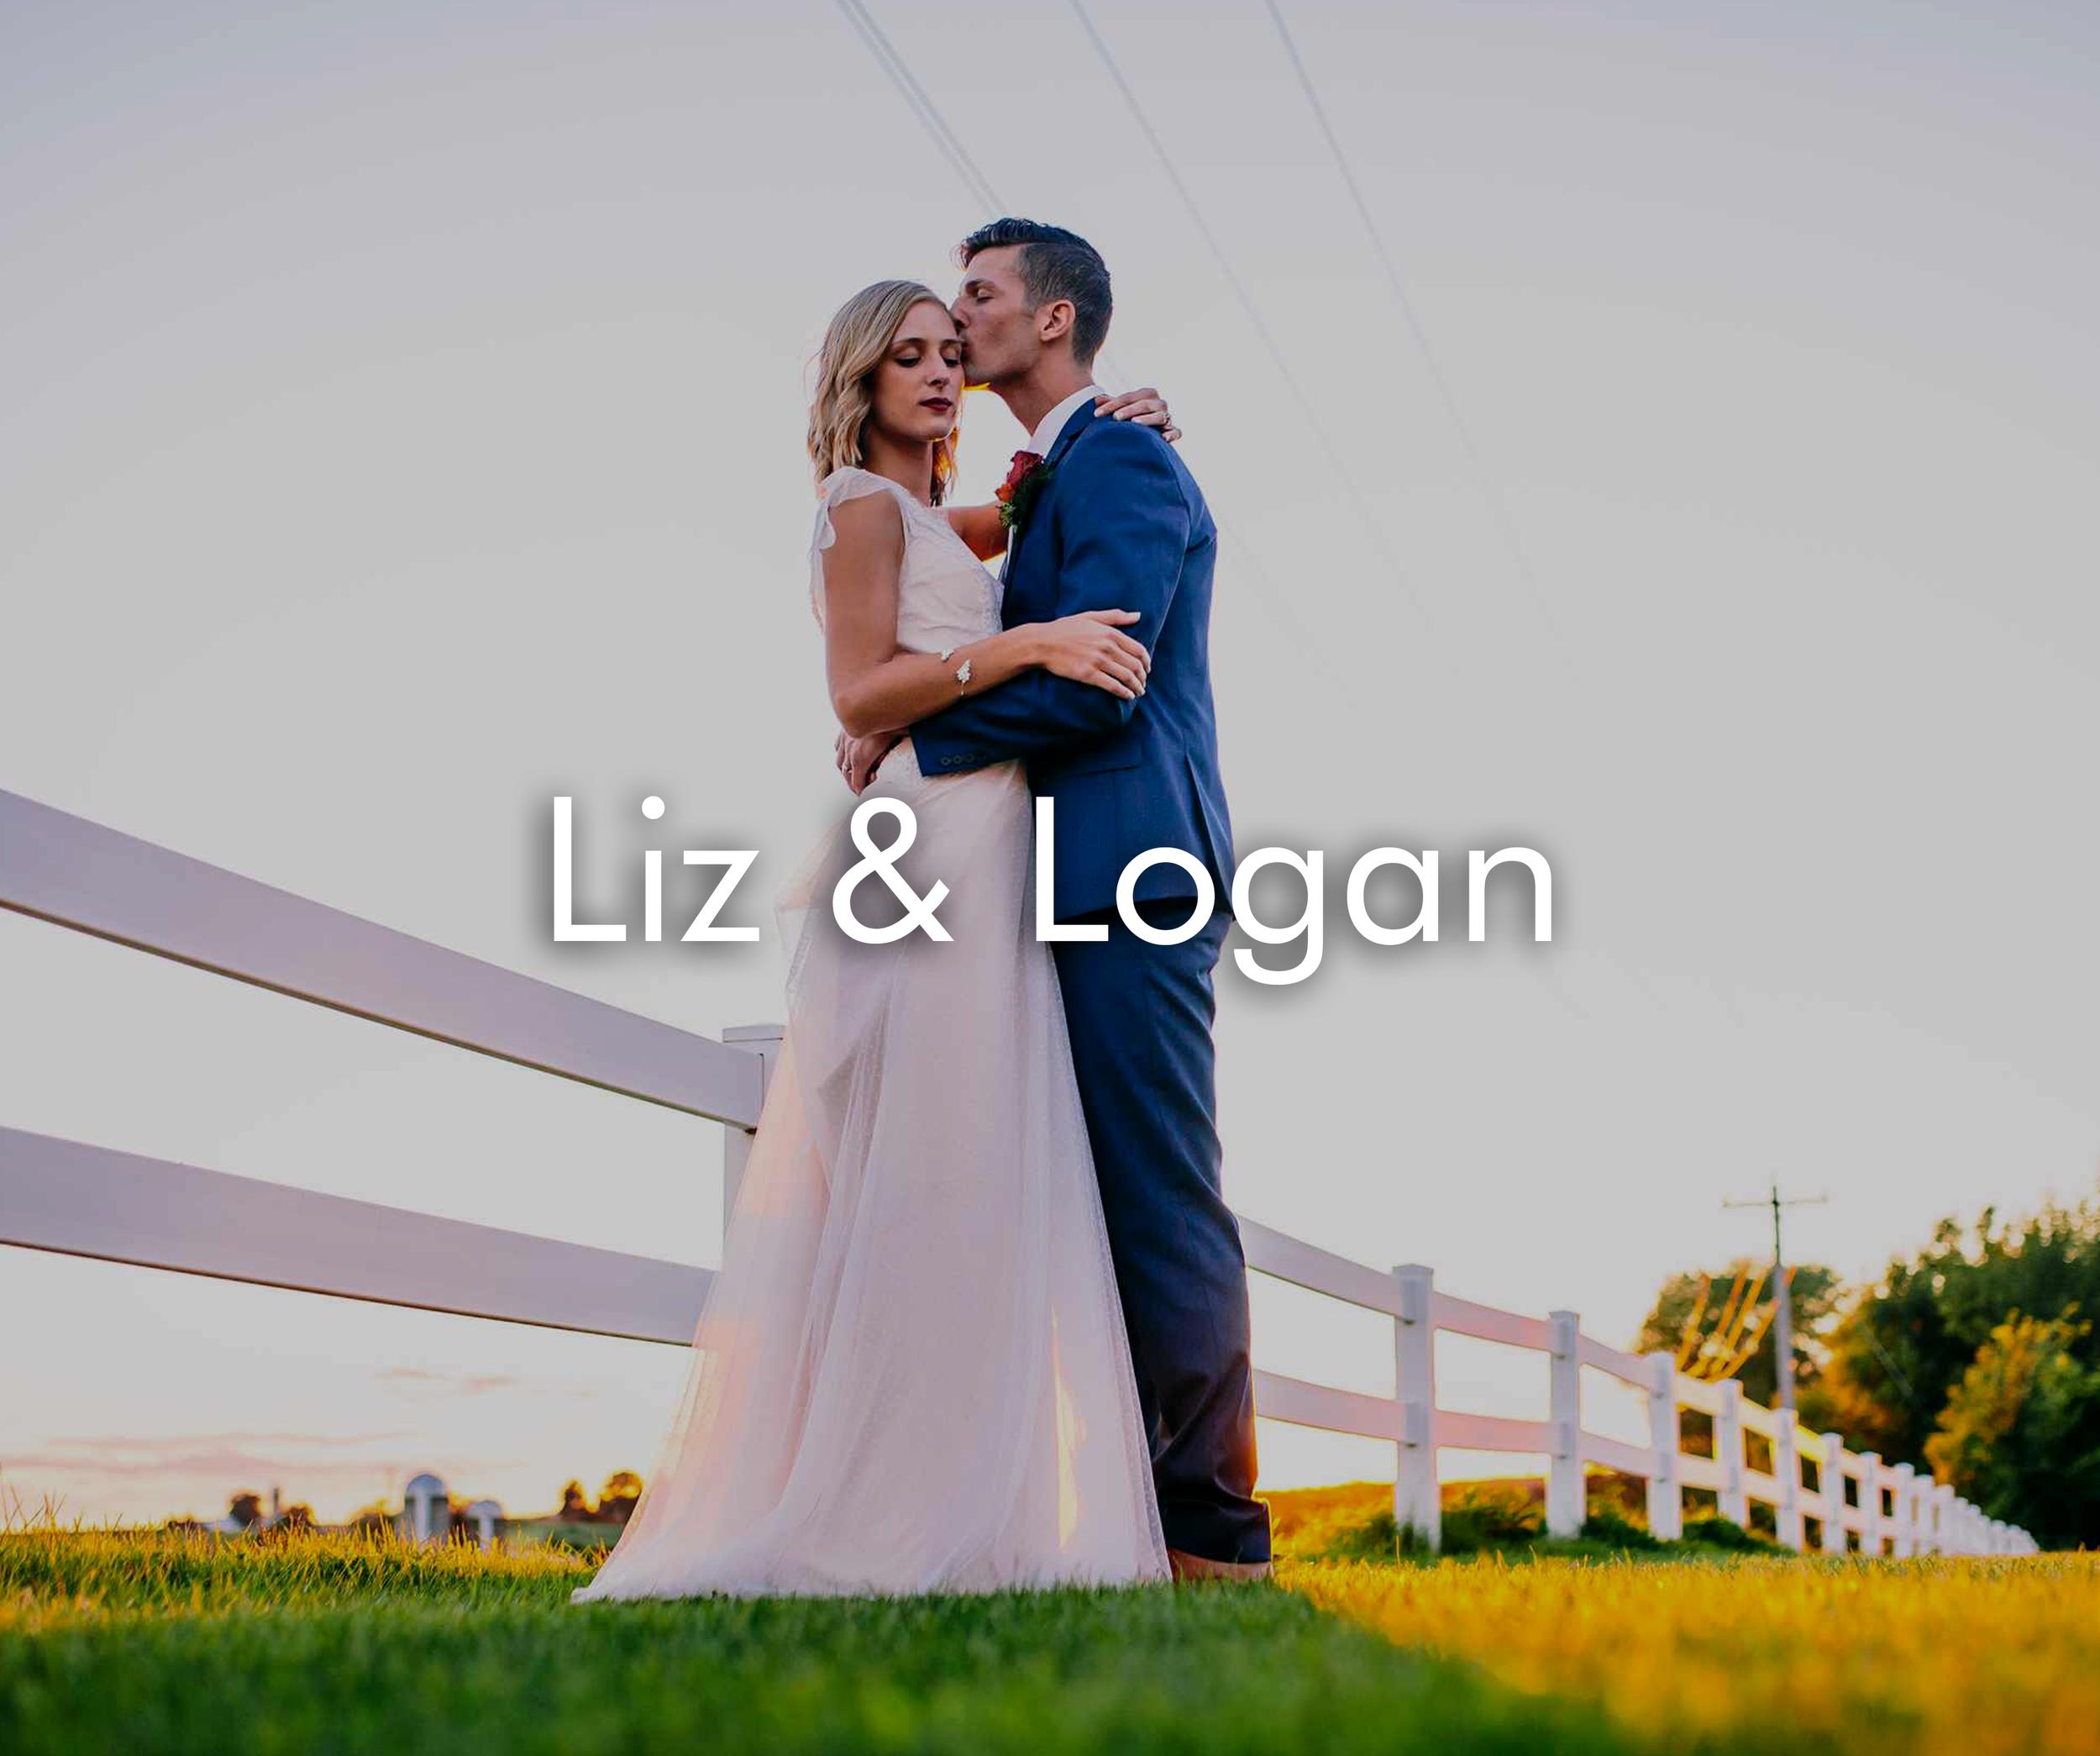 Liz-and-Logan-Words.png